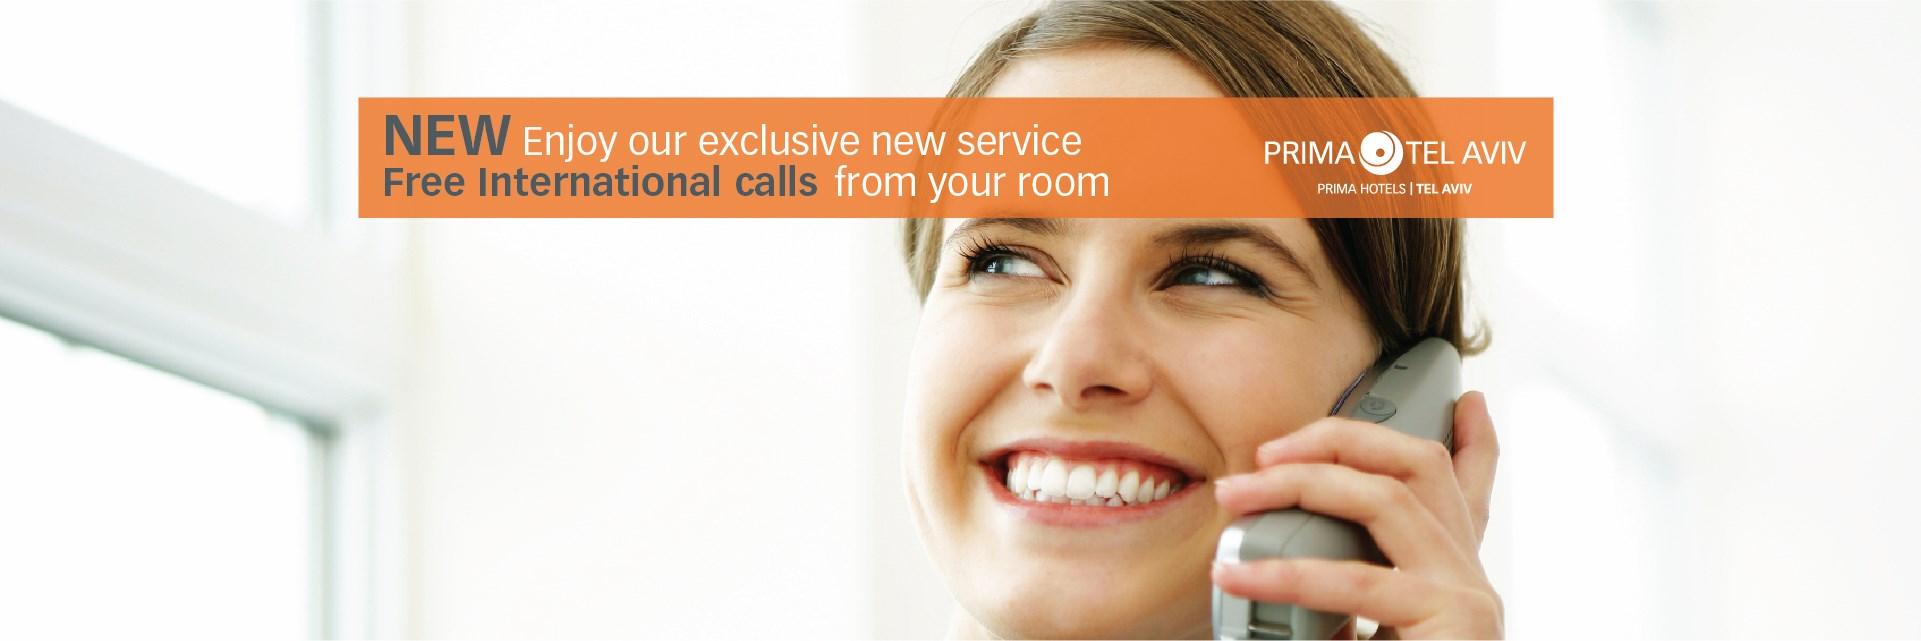 Free International Calls Prima Tel Aviv